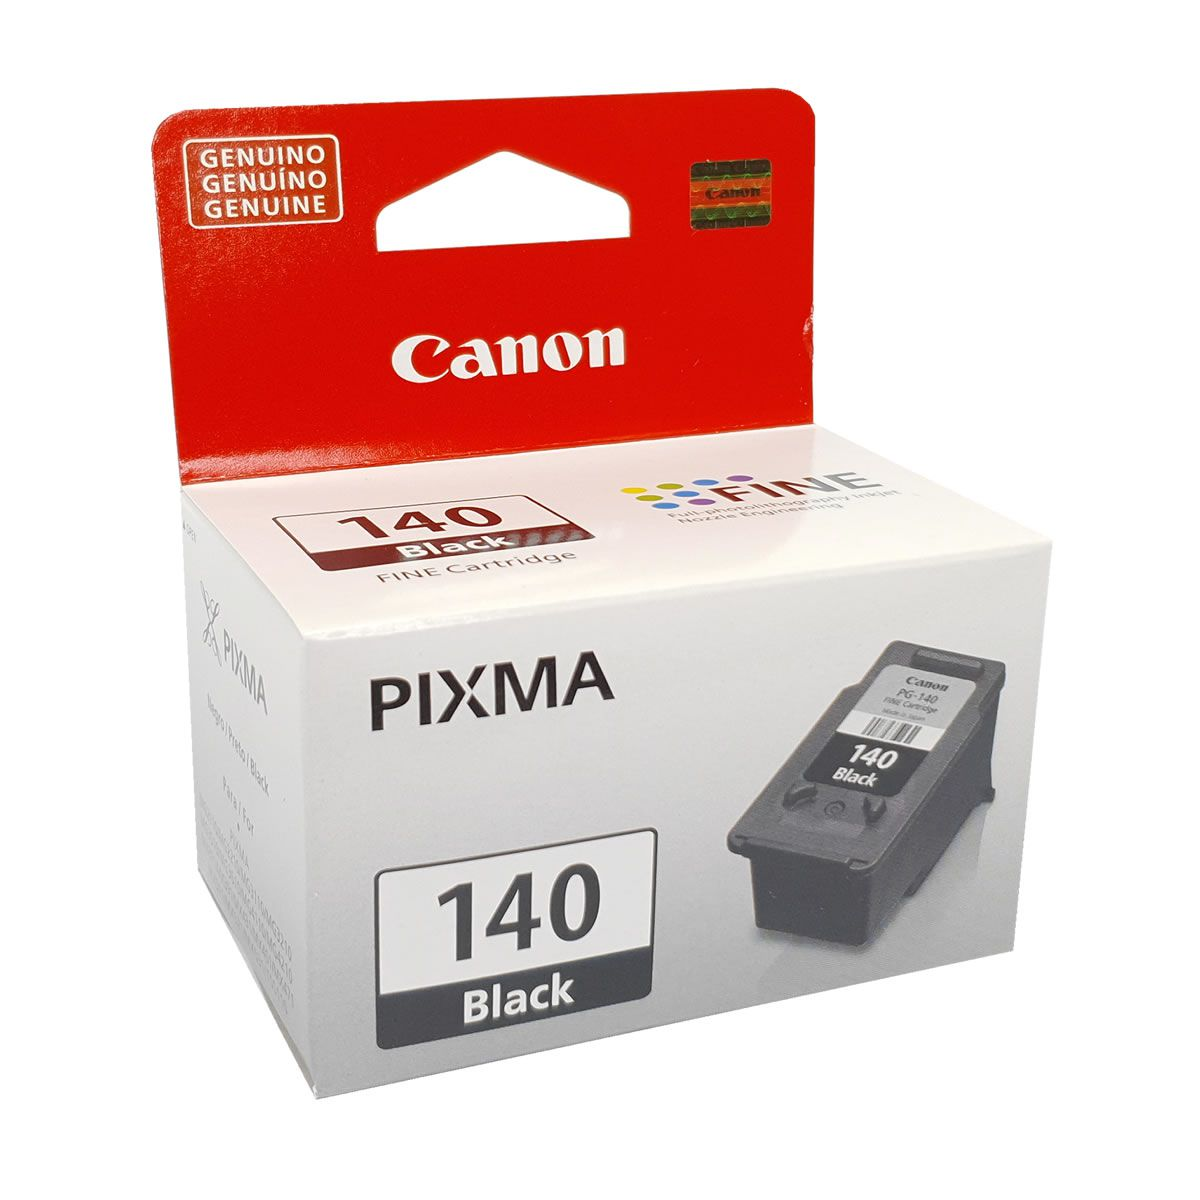 Cartucho PG140 preto original Canon para MG2110 MG3110 MG3510 MG3210 MG4110 MG3210 MX431 MX371